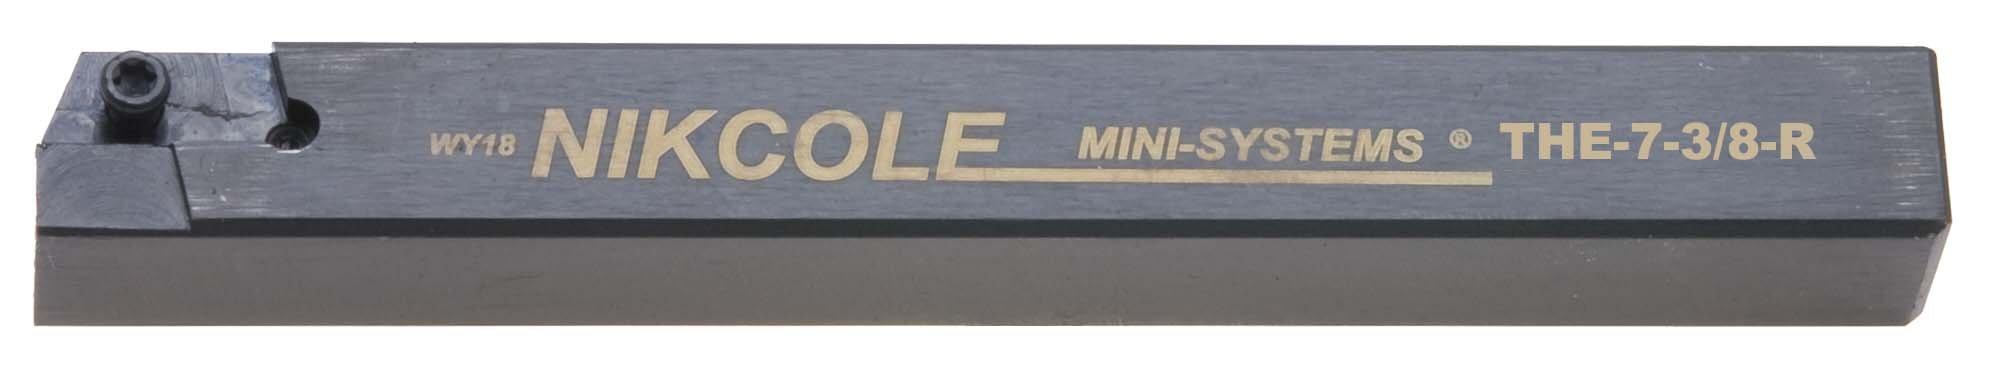 Nikcole THE-7-3/8-R .375'' Sq. RH Mini-System Tool Holder